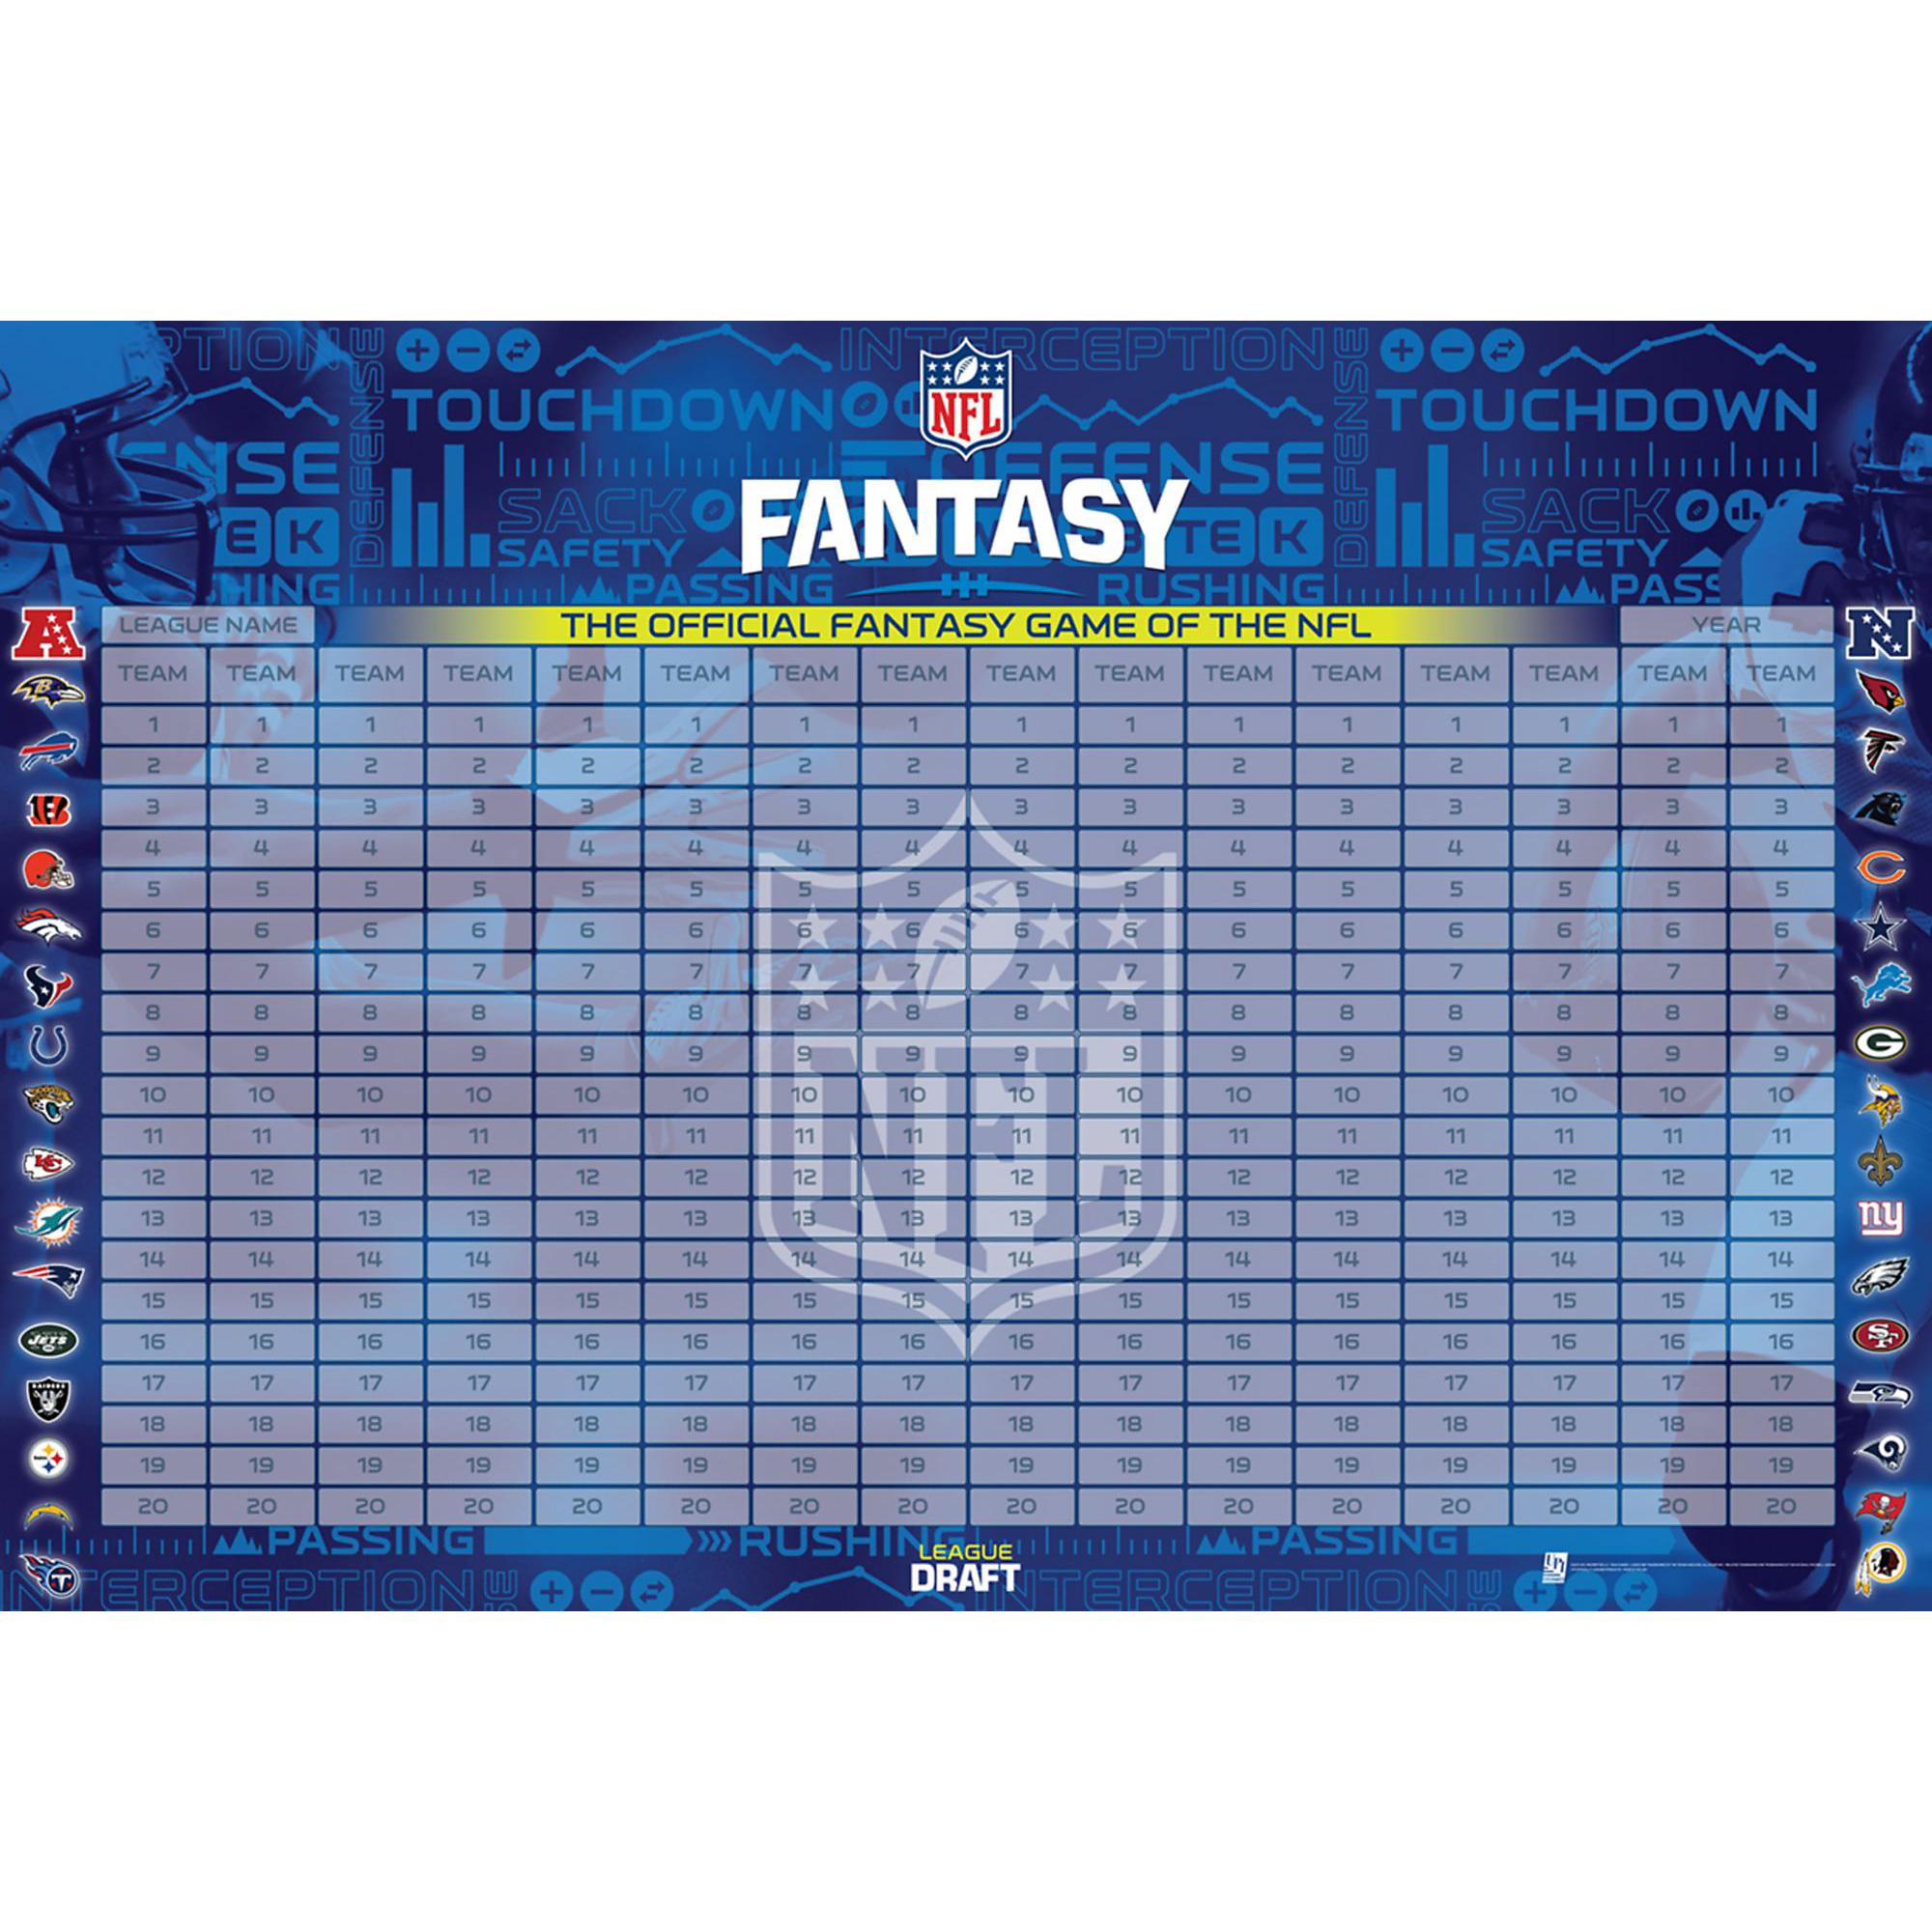 Dallas Cowboys NFL Fantasy Football Draft Kit